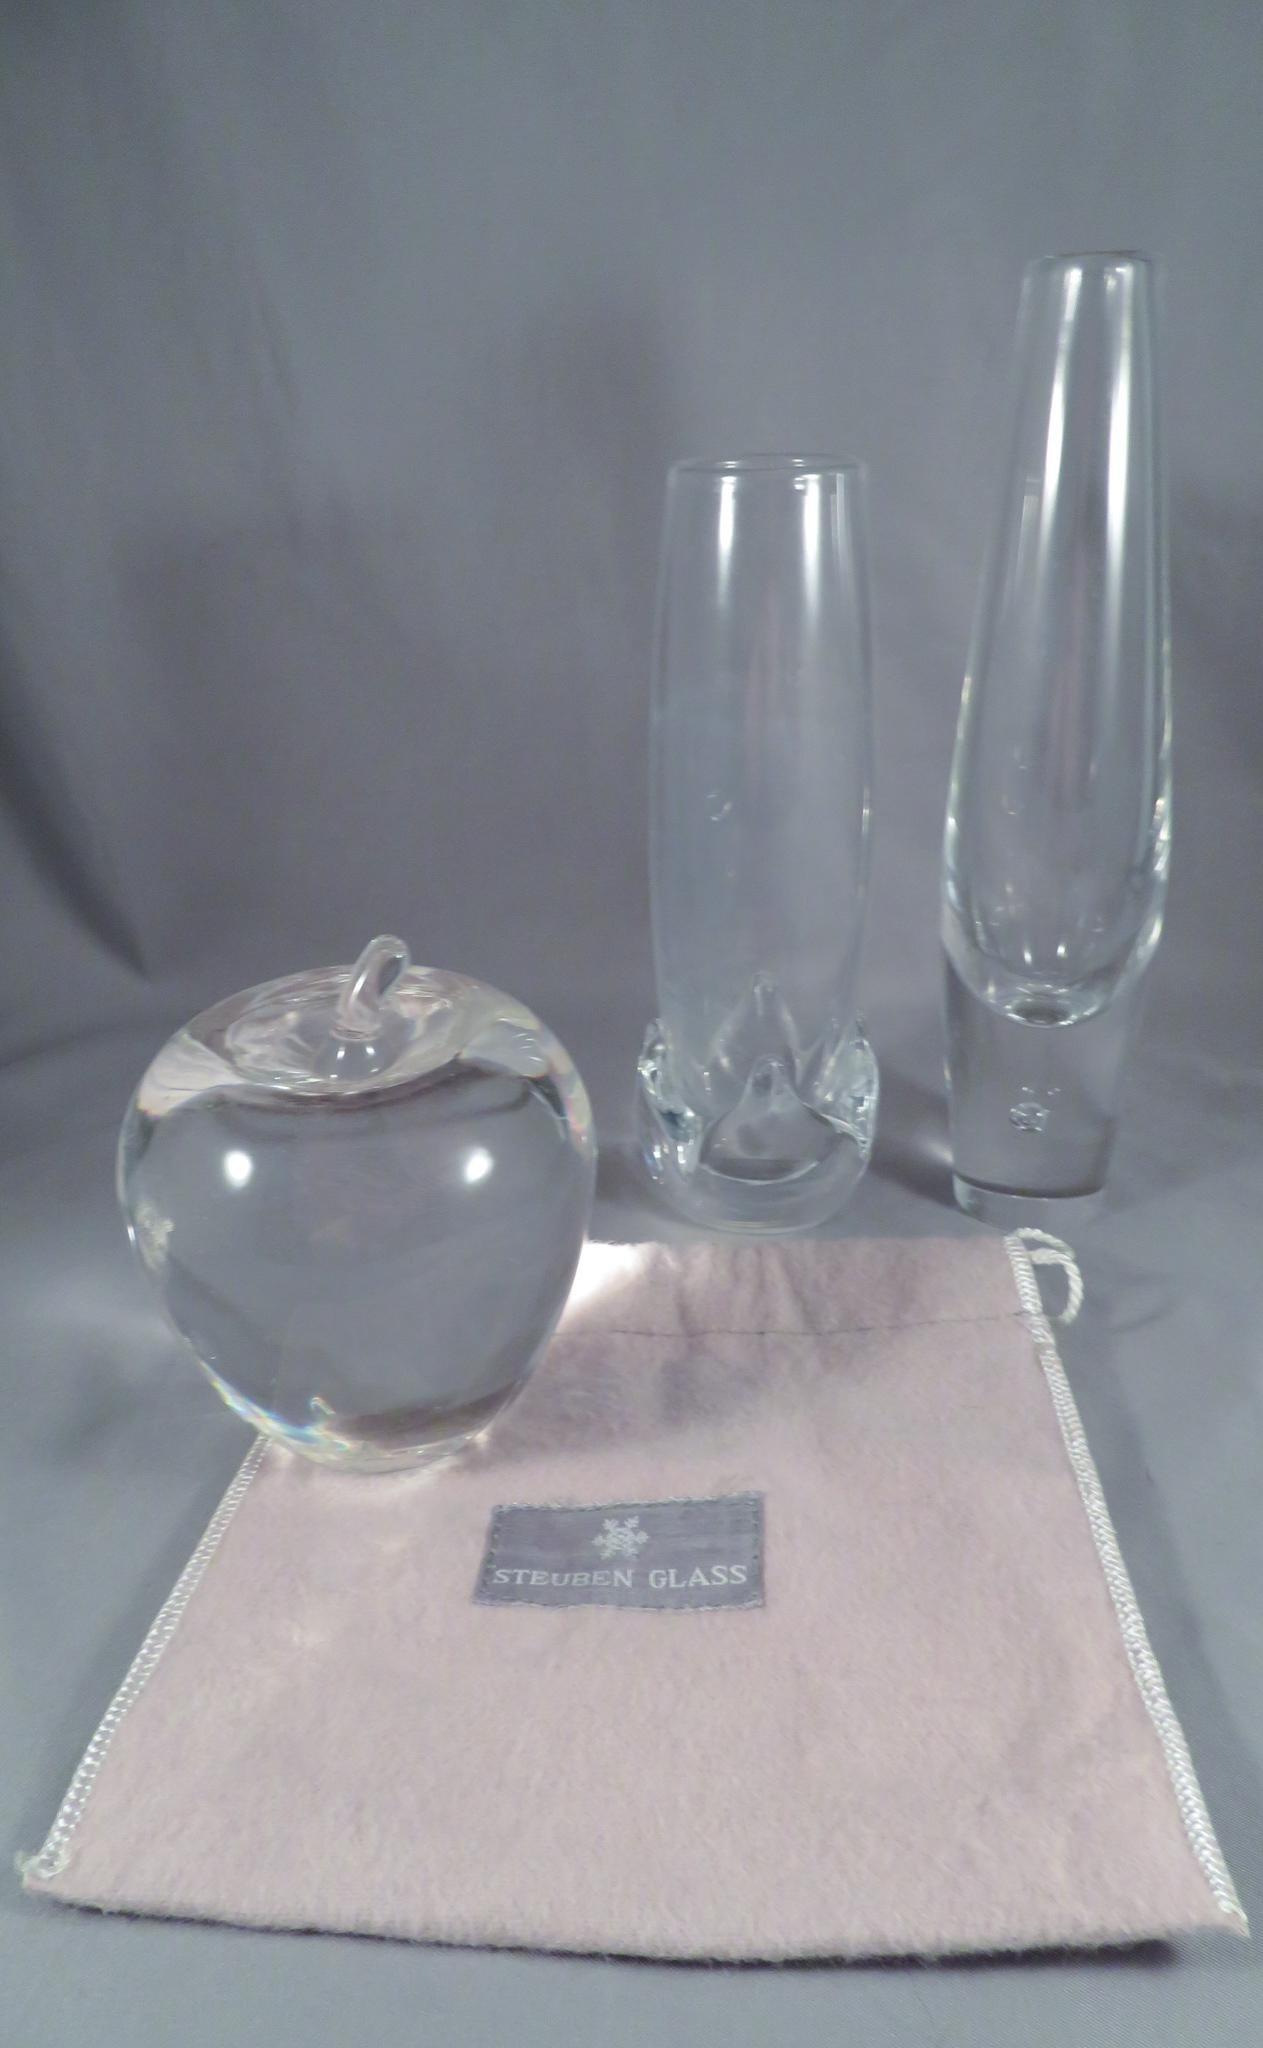 Steuben Glass Teardrop Bud Vase & Apple Paperweight